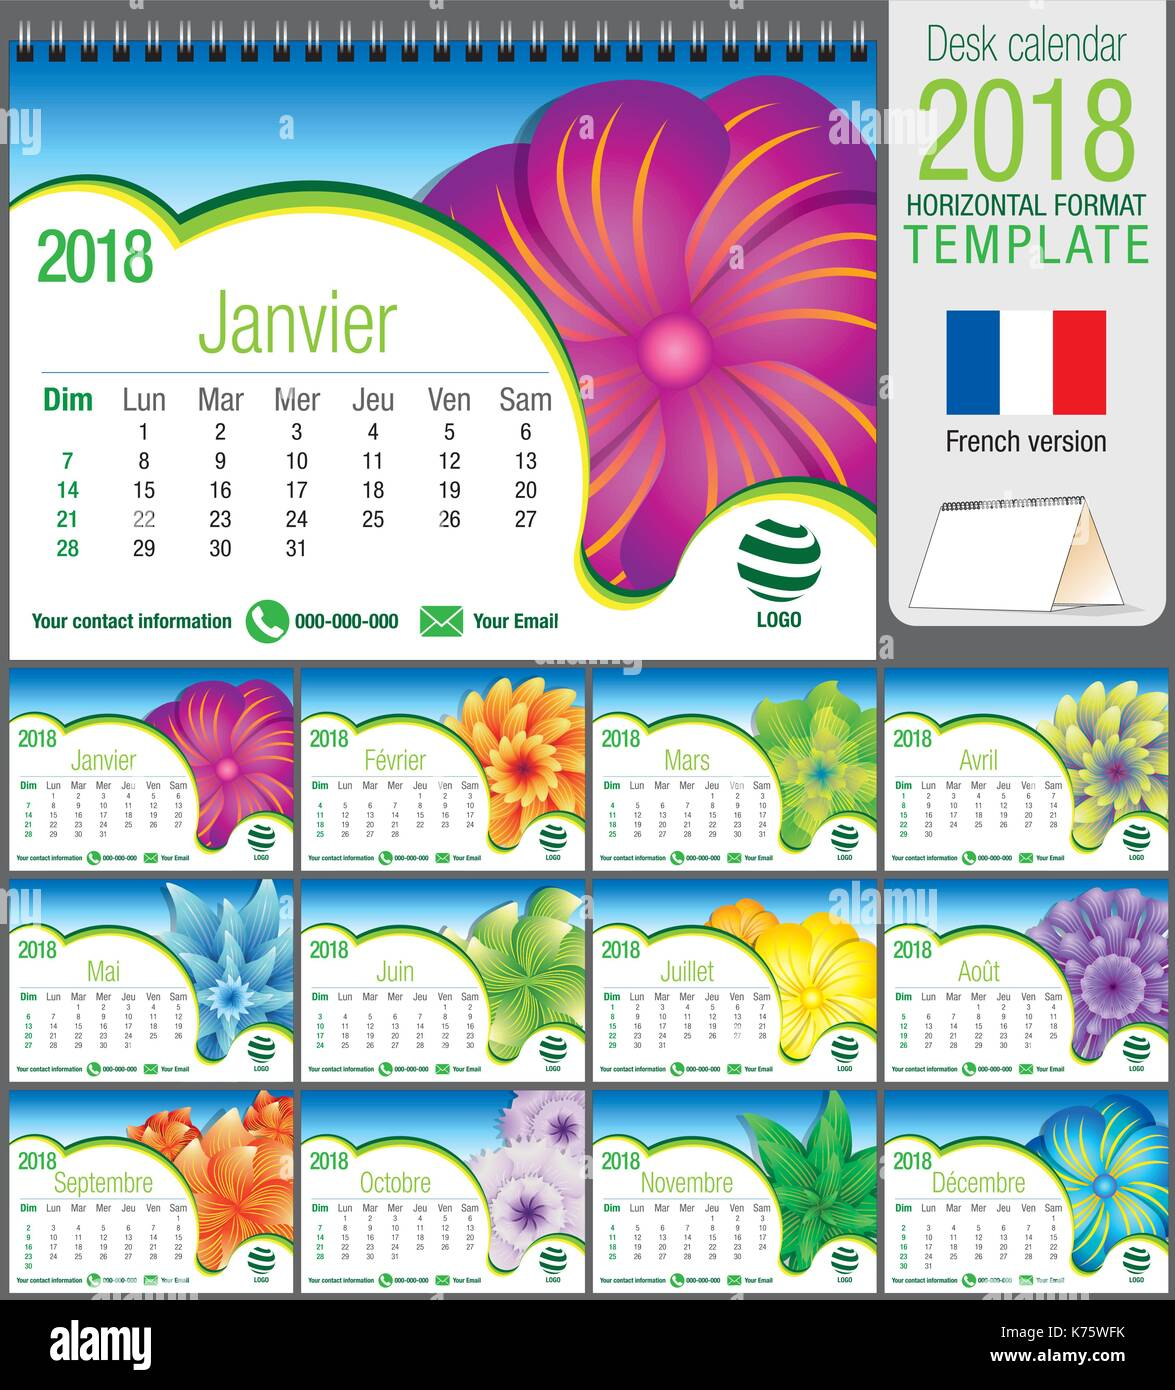 Calendar Design 2018 : Desk triangle calendar template with abstract floral